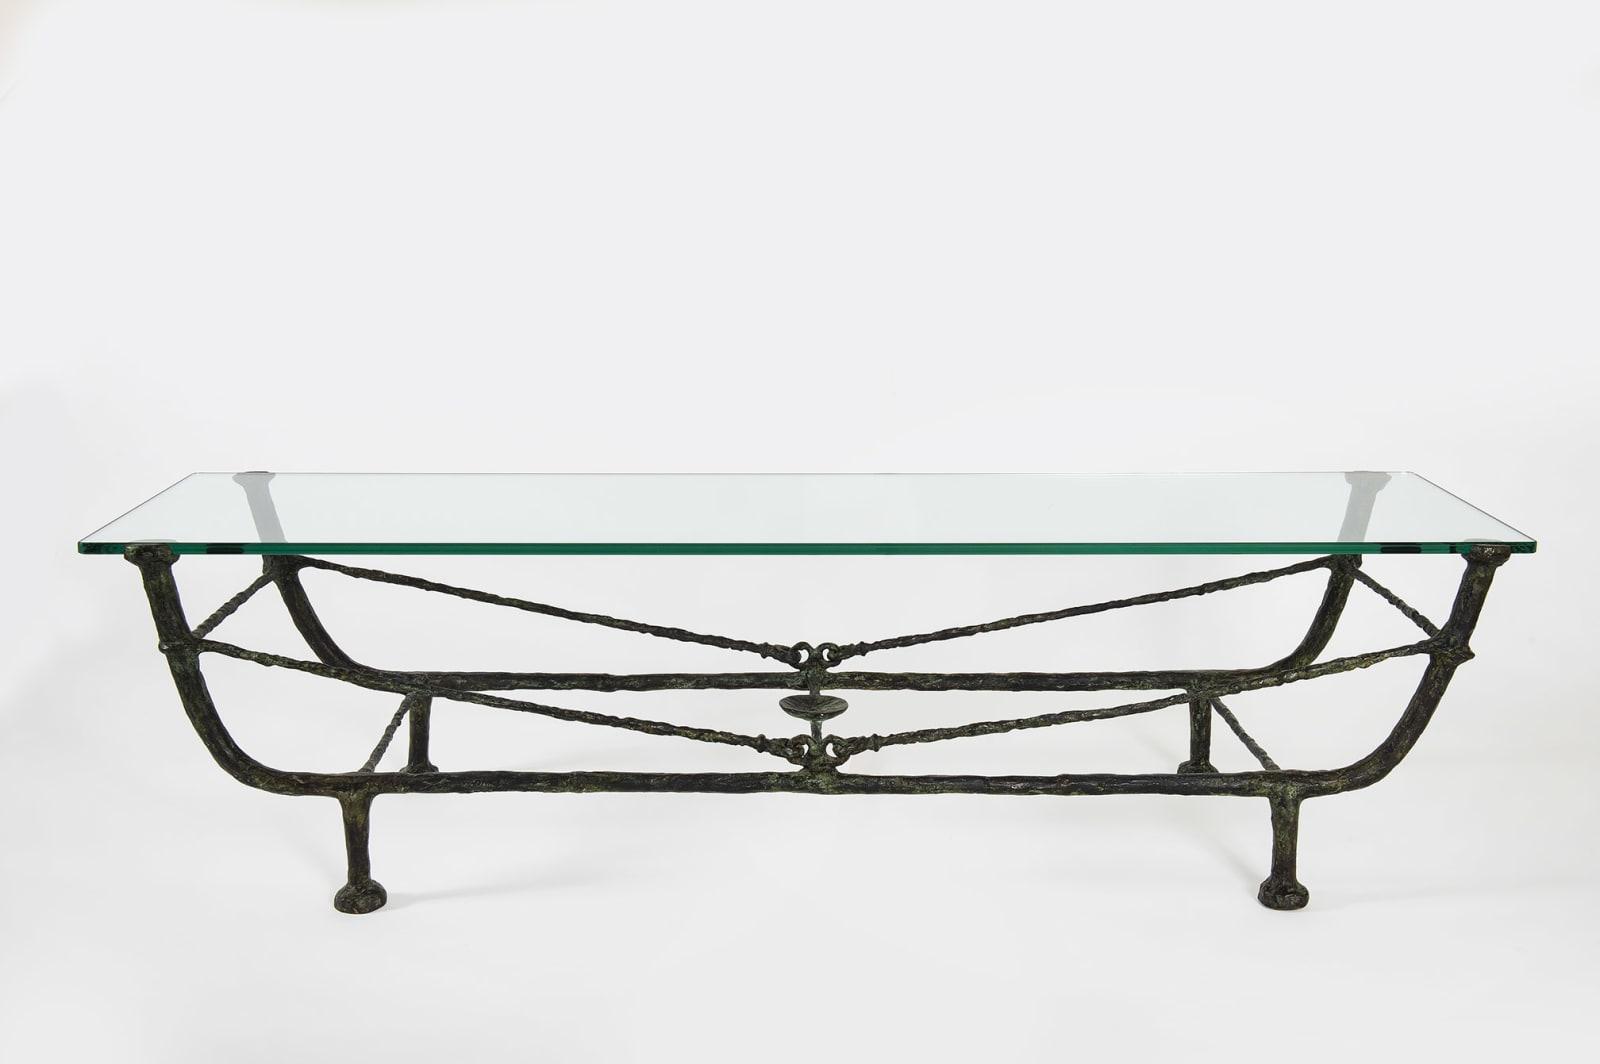 DIEGO GIACOMETTI, Table berceau, Première version, circa 1963